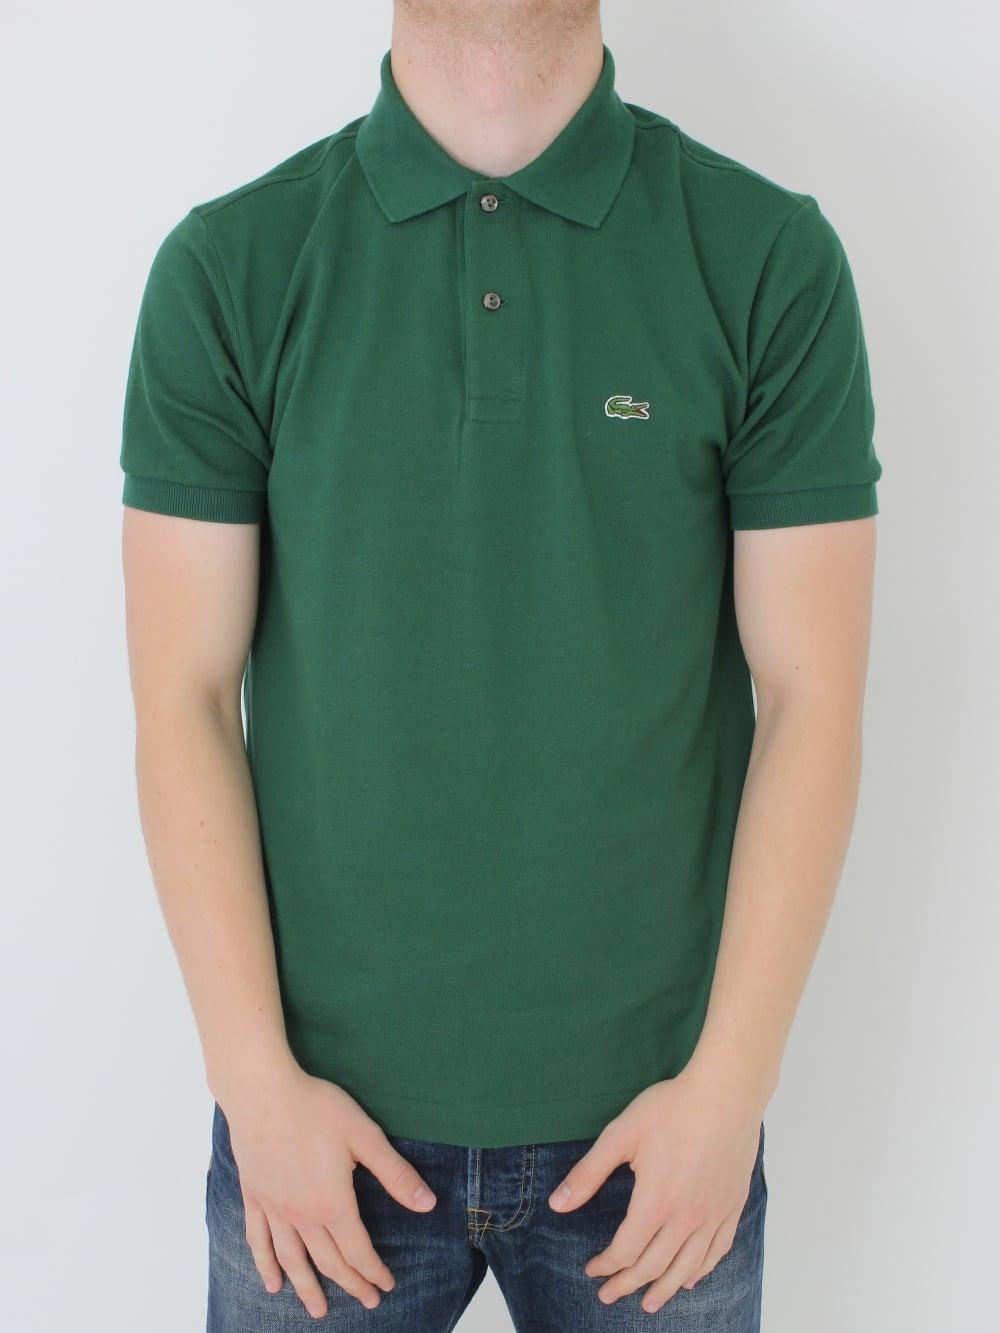 0b61dbee1d97be Lacoste L1212 Classic Pique Polo Shirt